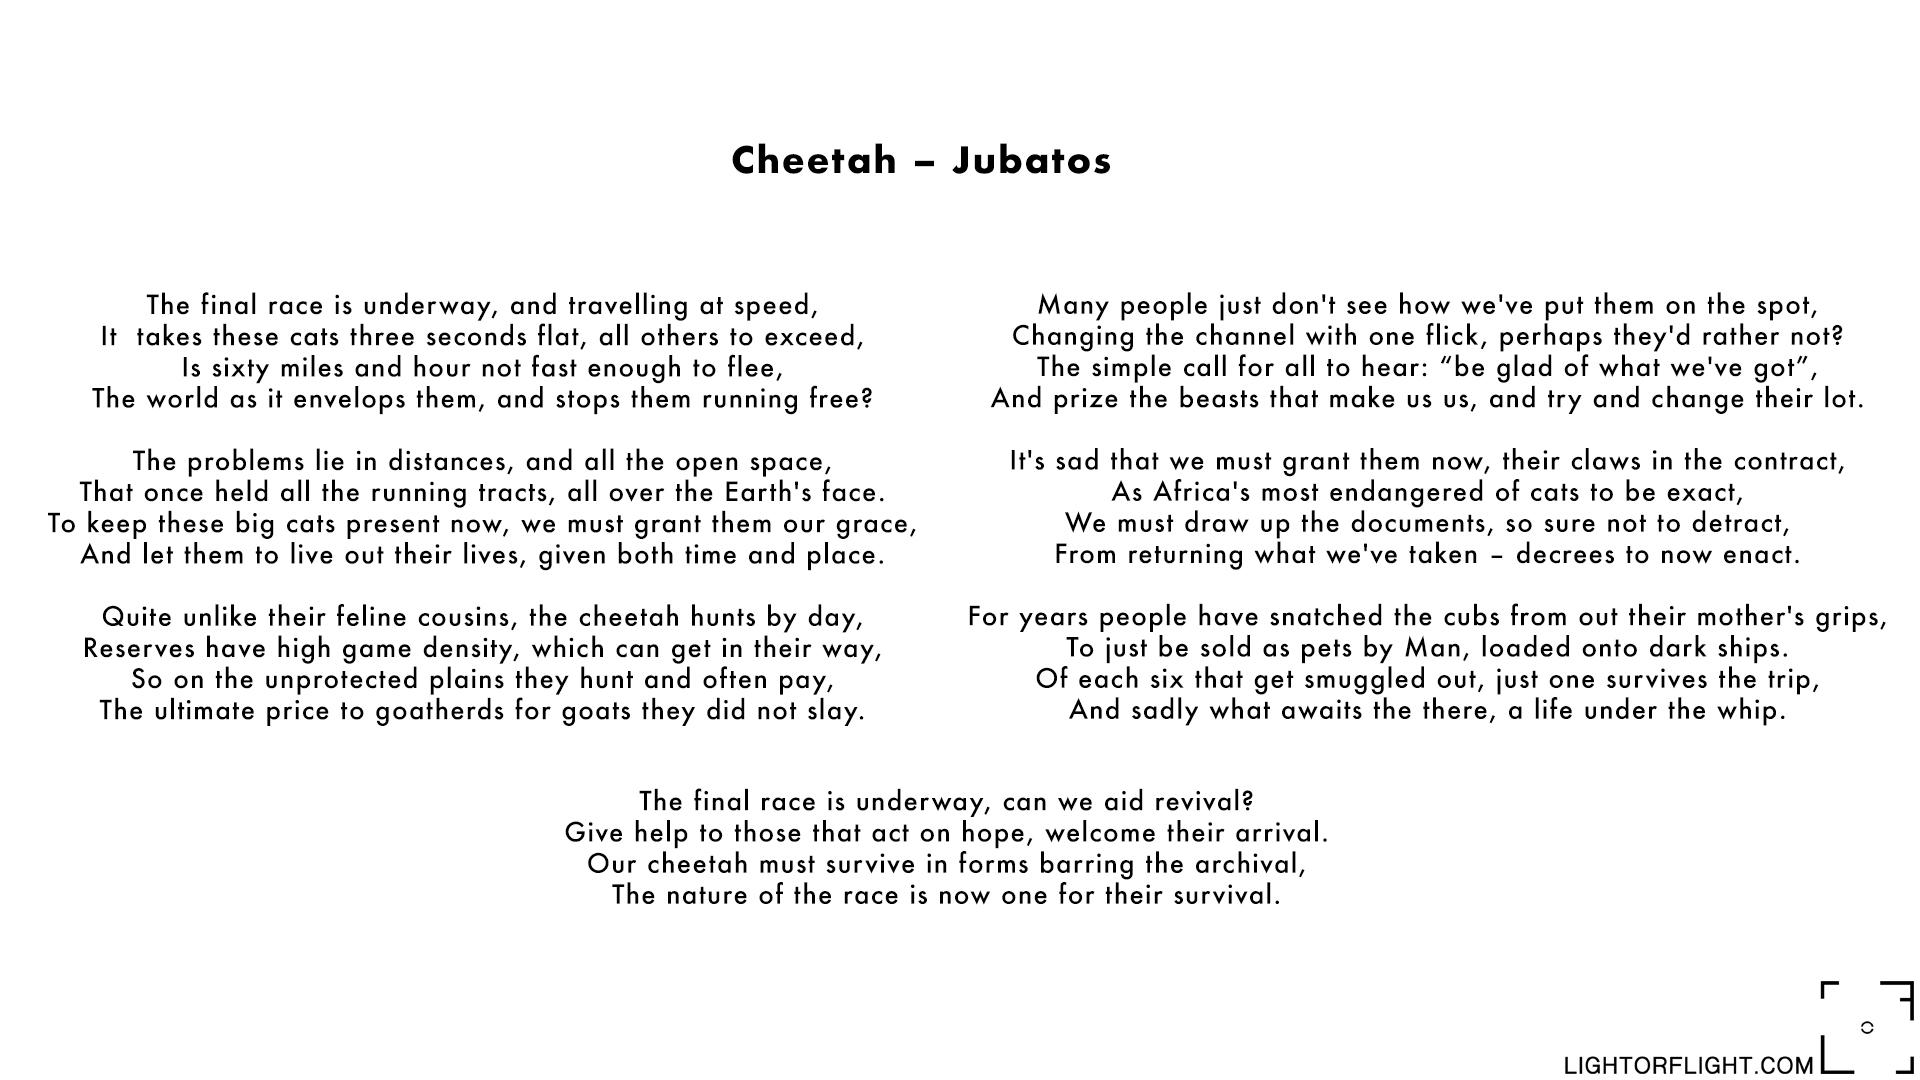 Cheetah - Jubatos.jpg